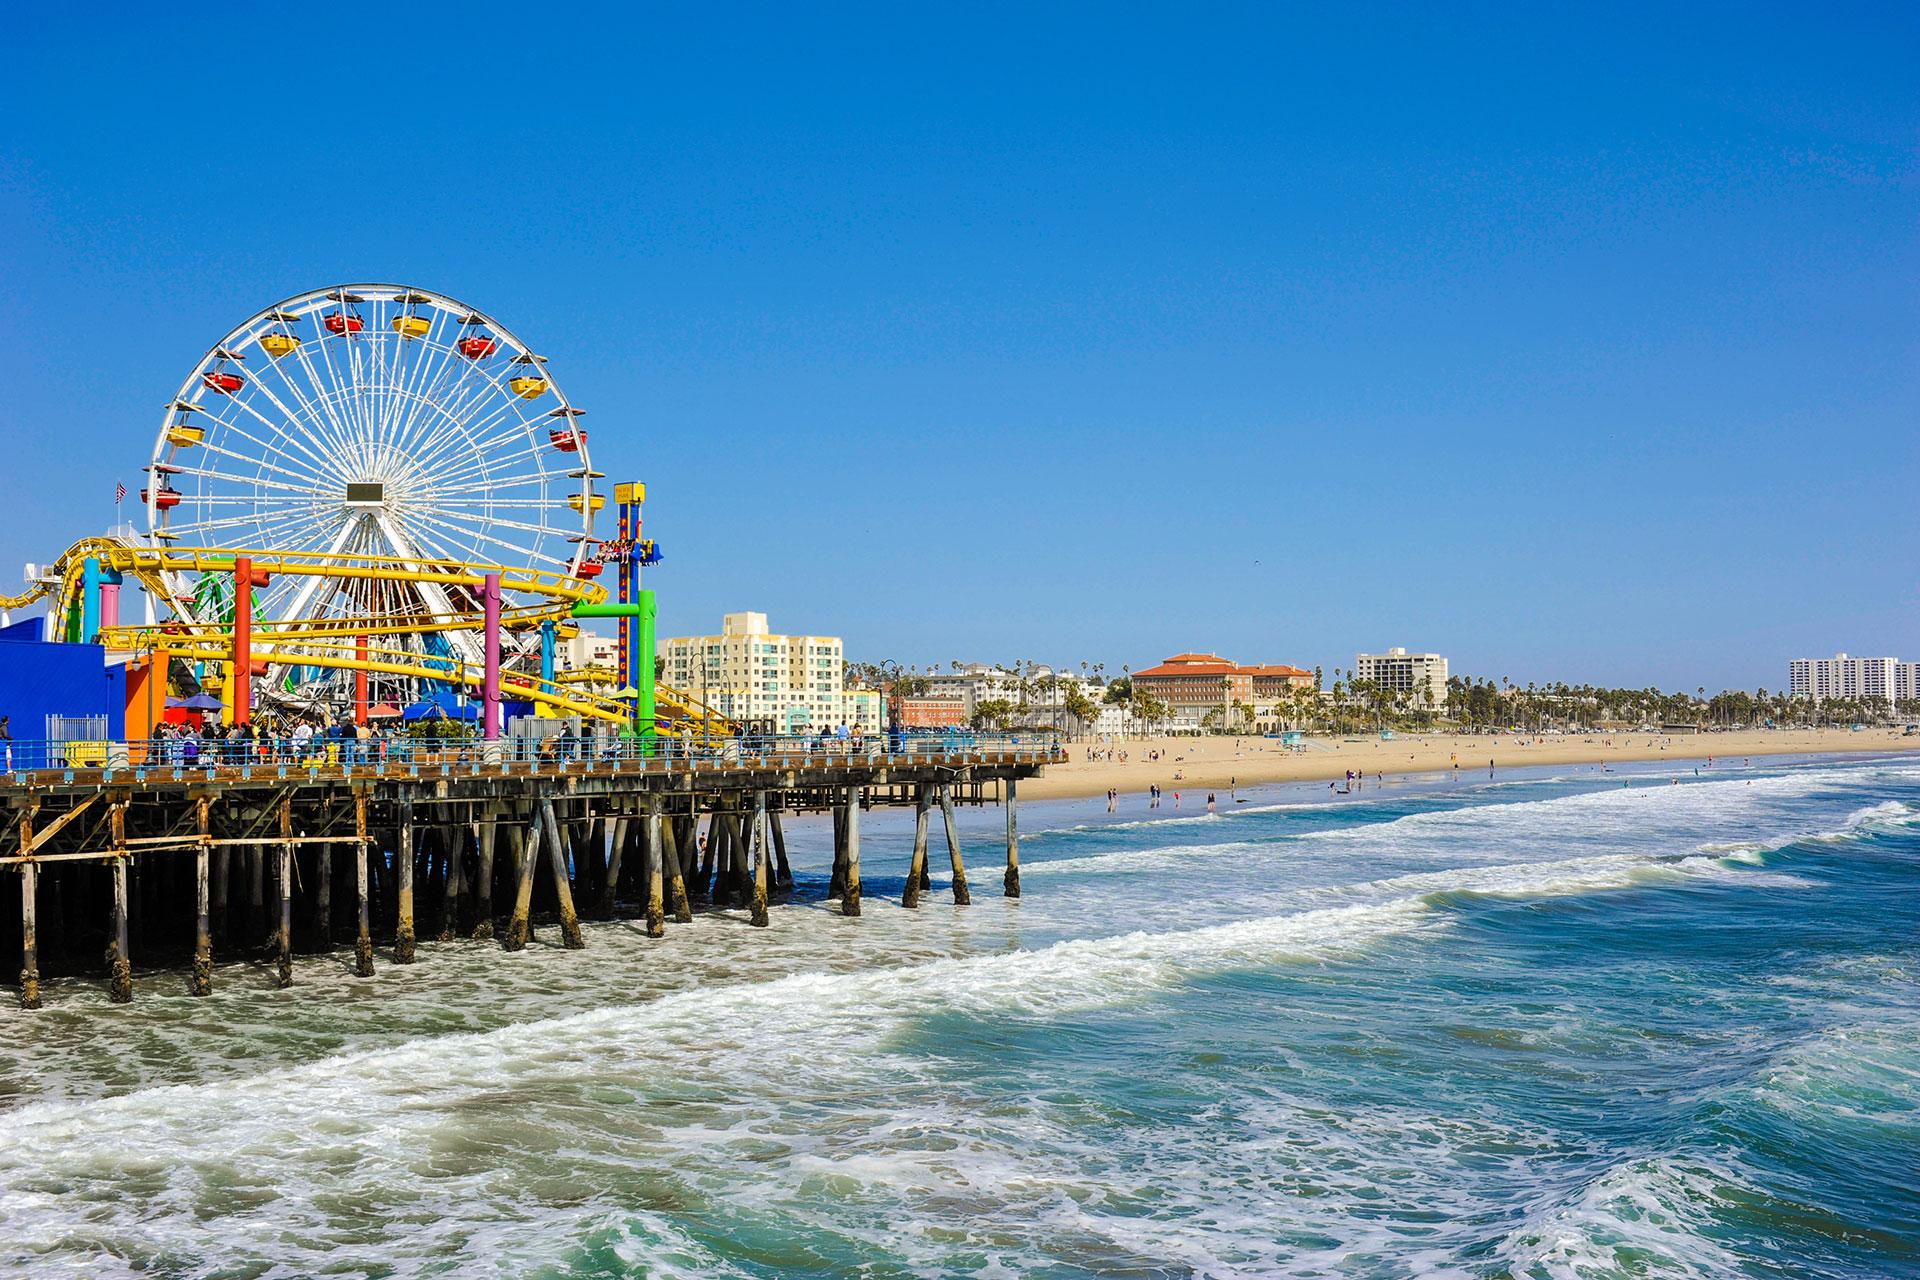 Santa Monica Pier; Courtesy of Mark and Anna Photography/Shutterstock.com